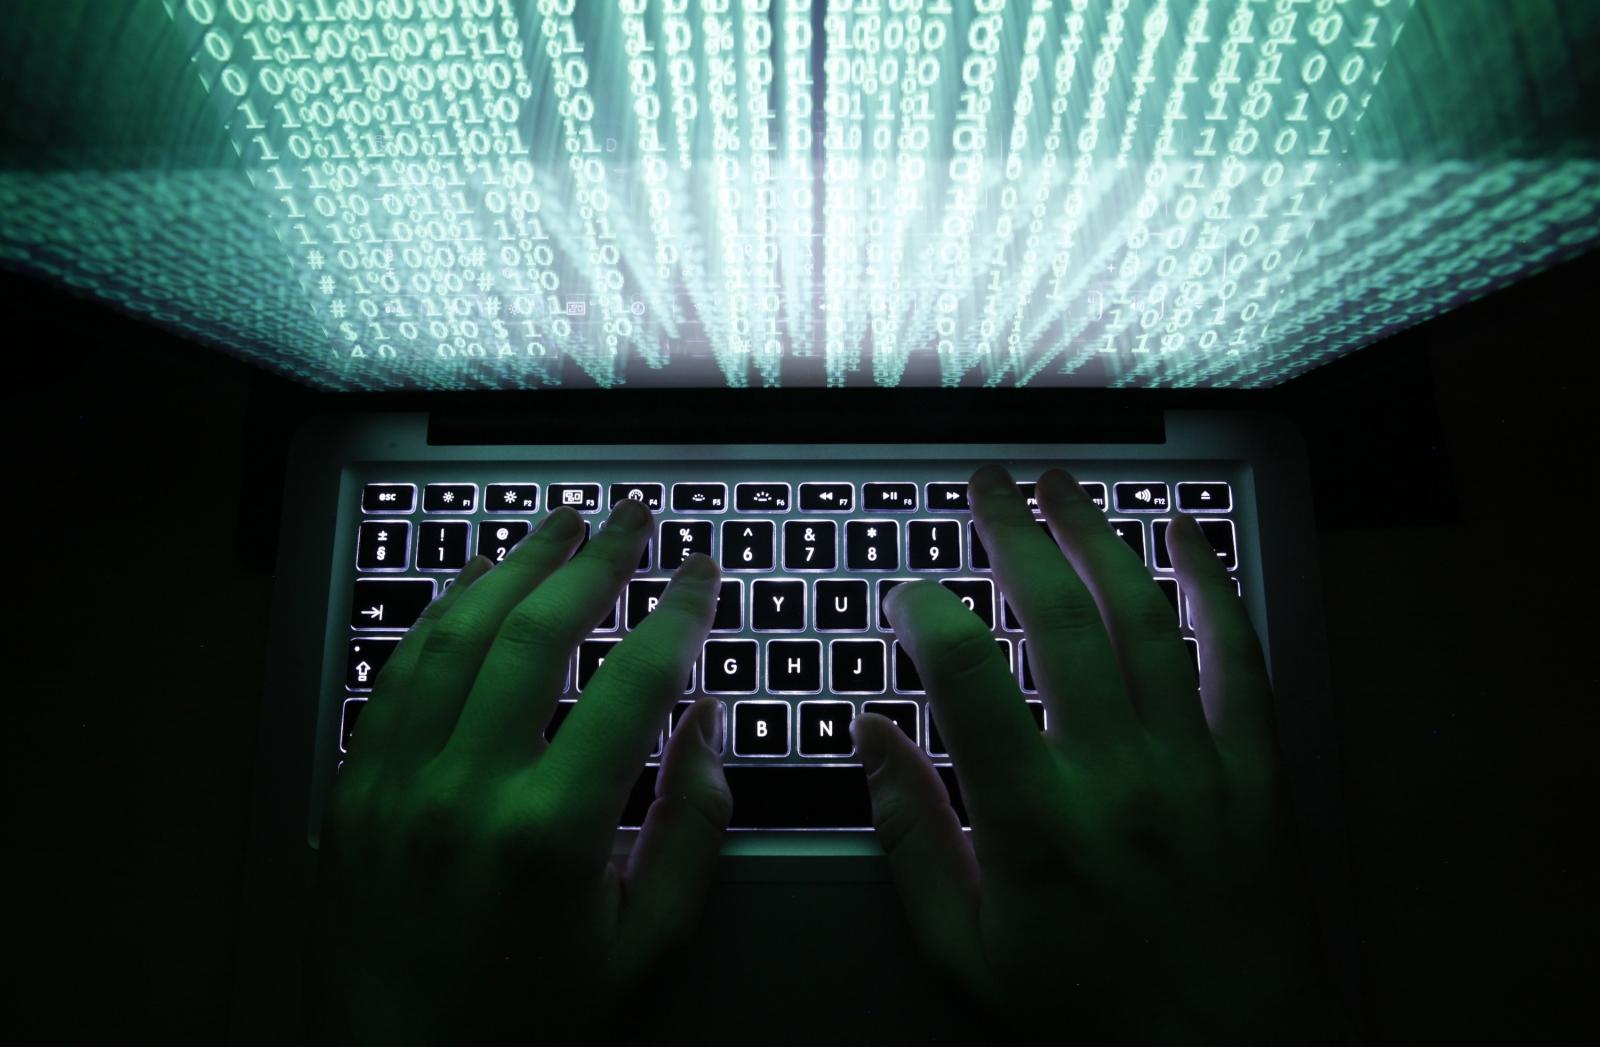 Mirai botnet hackers unleash cyber turf war, enslave Chinese firm's surveillance cameras